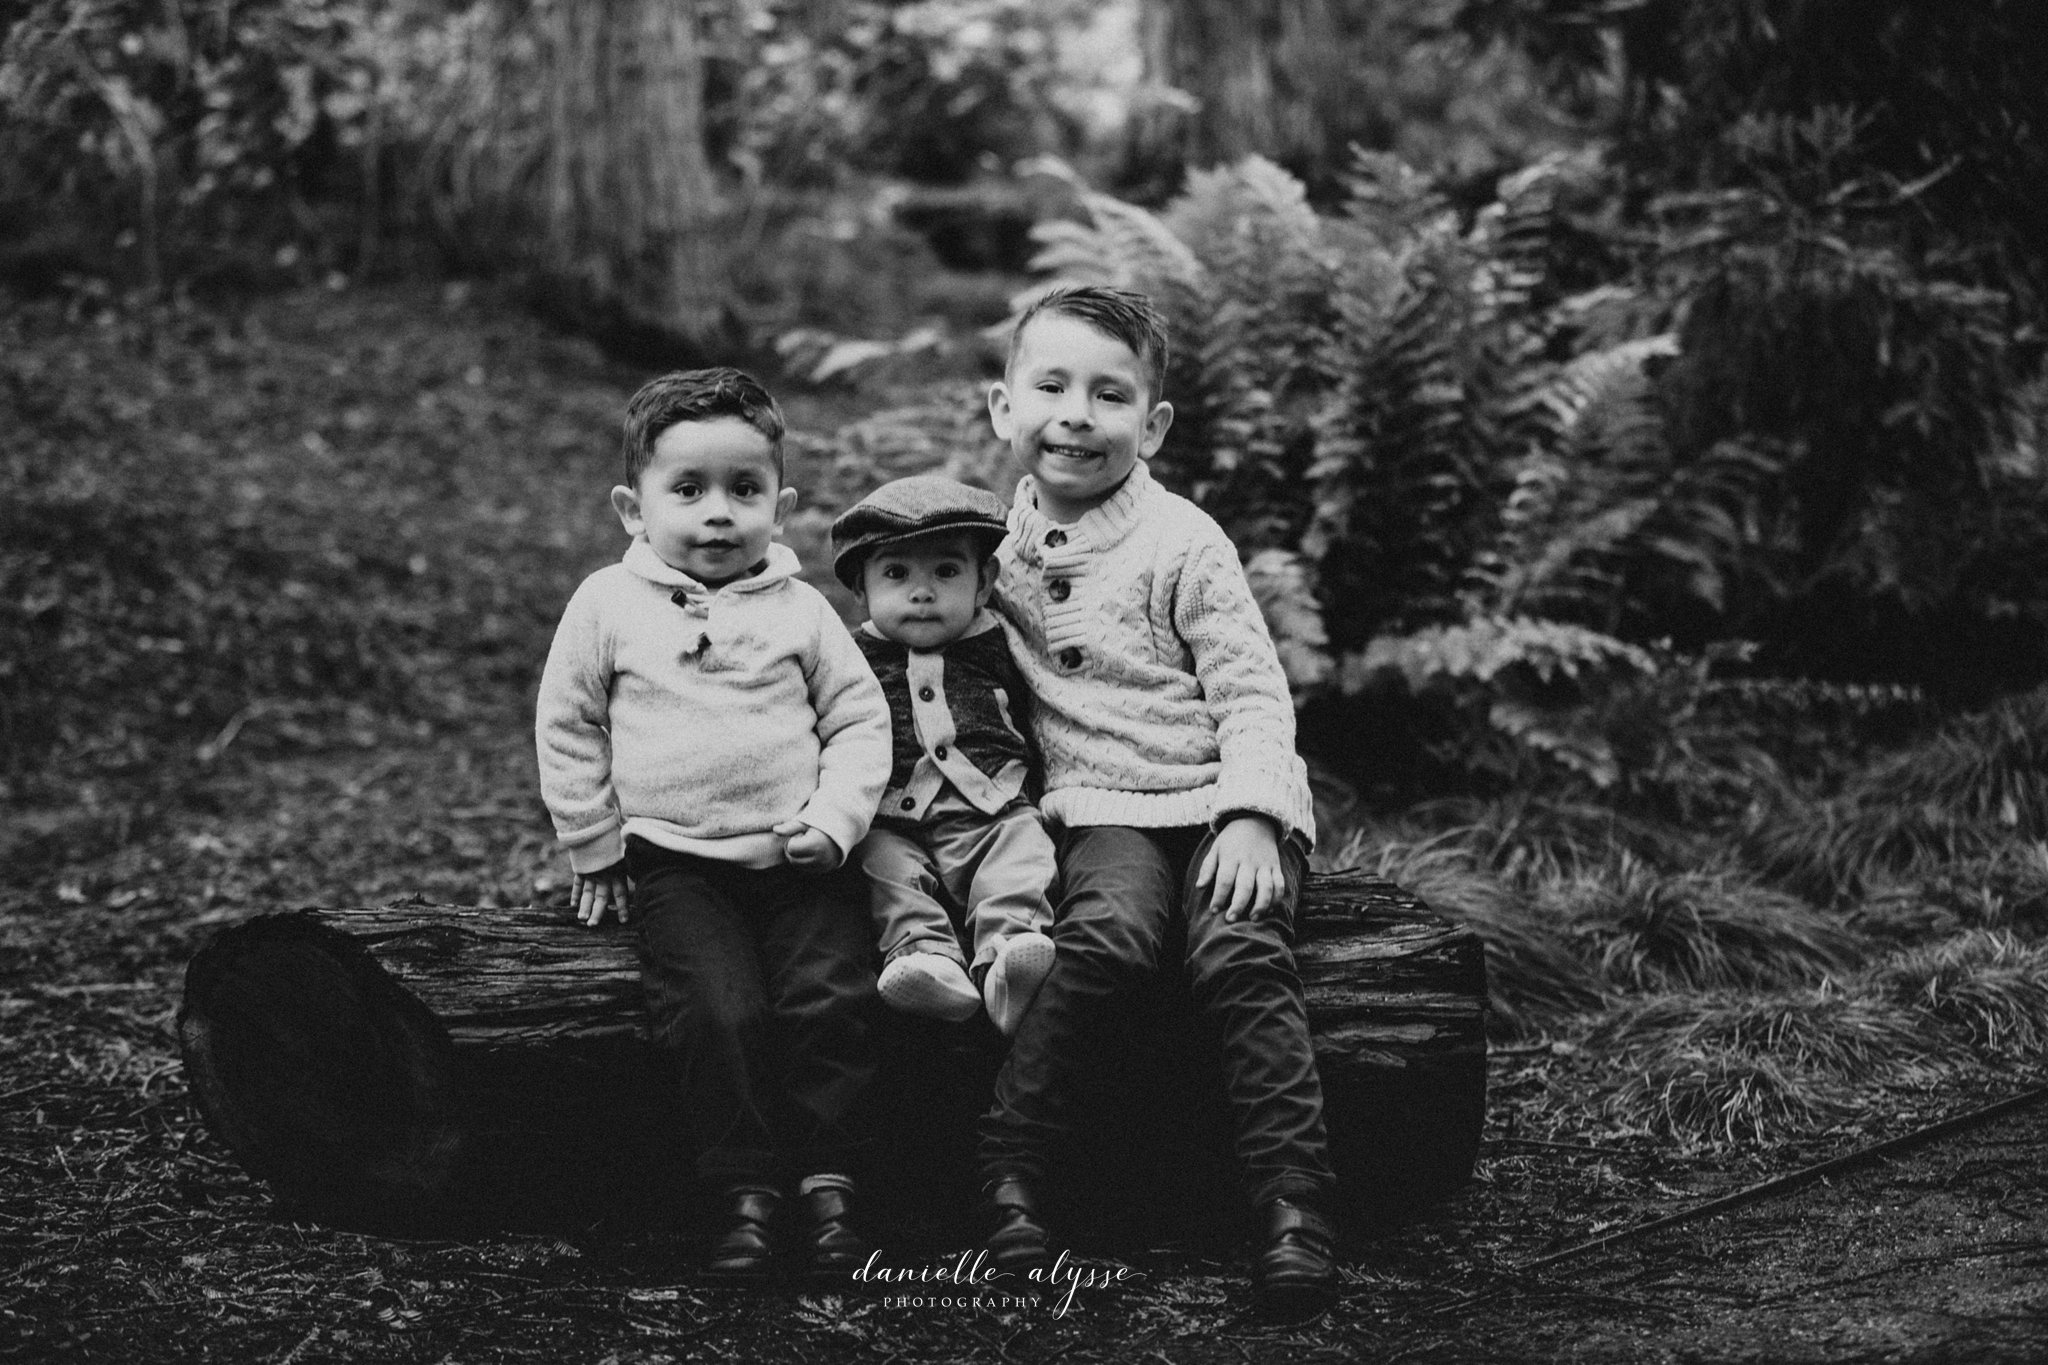 181205_family_portrait_fall_davis_arboretum_andrea_danielle_alysse_photography_16_WEB.jpg